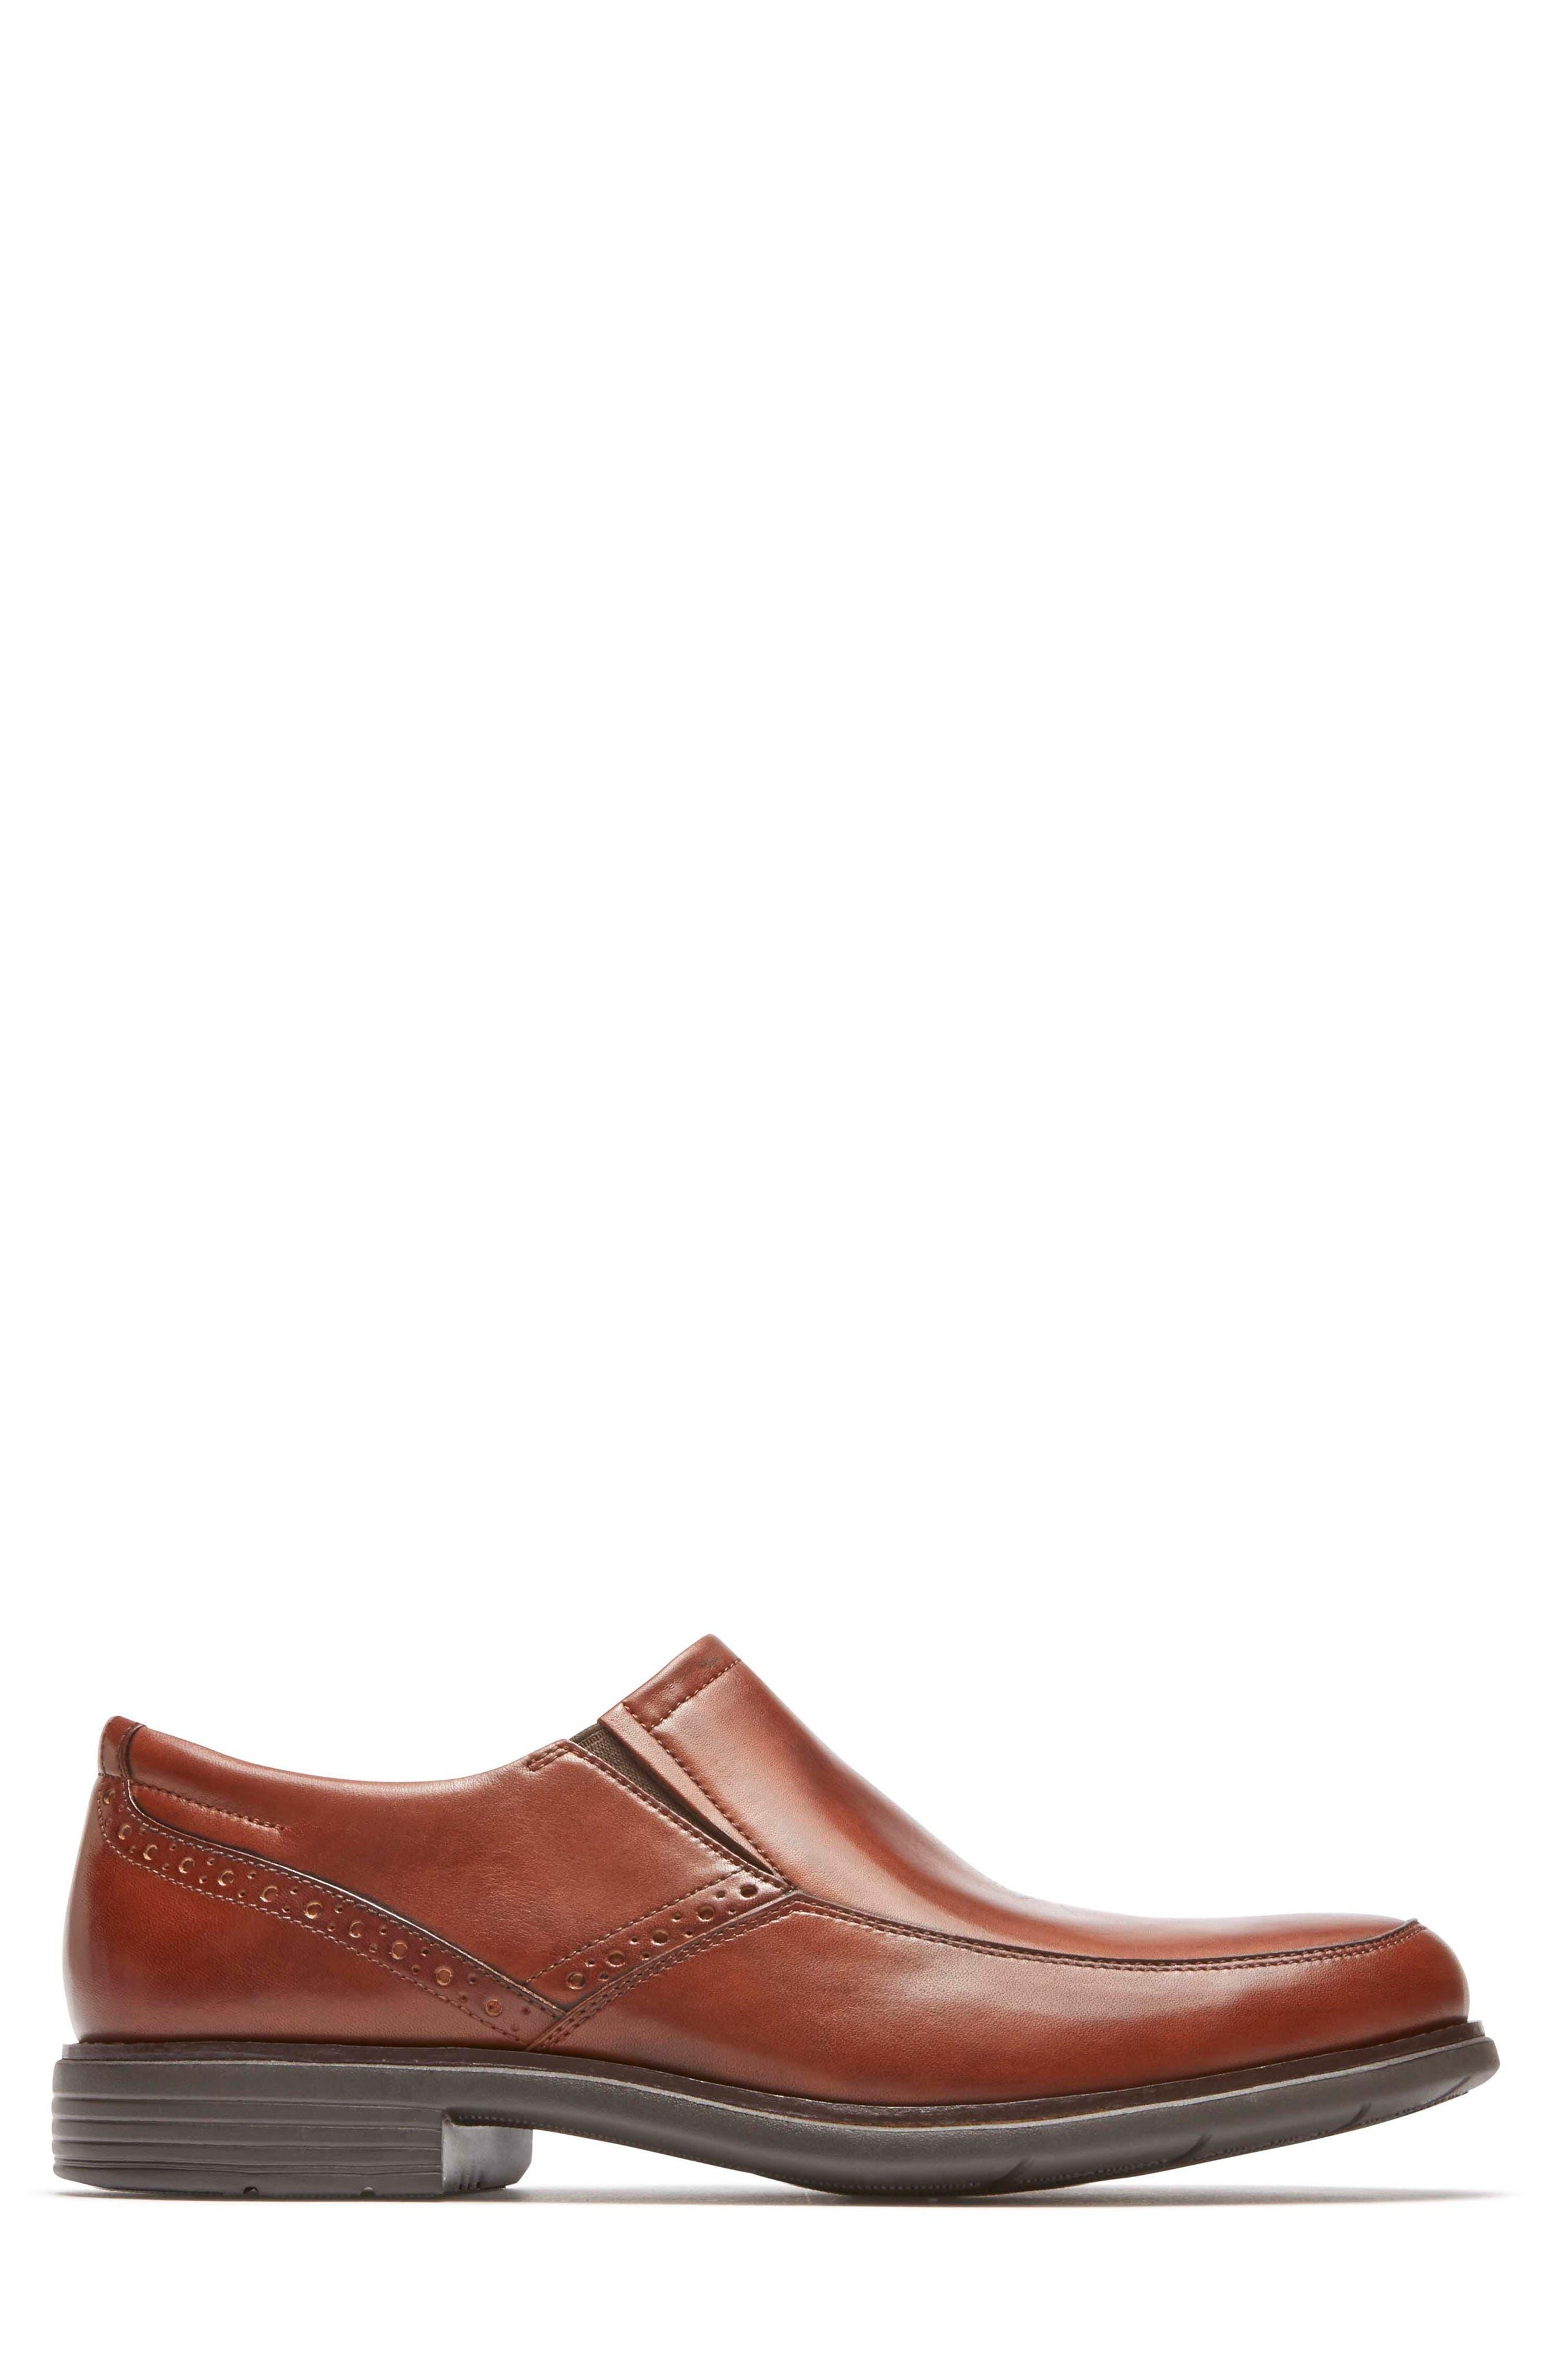 Total Motion Classic Dress Venetian Loafer,                             Alternate thumbnail 3, color,                             Tan Leather